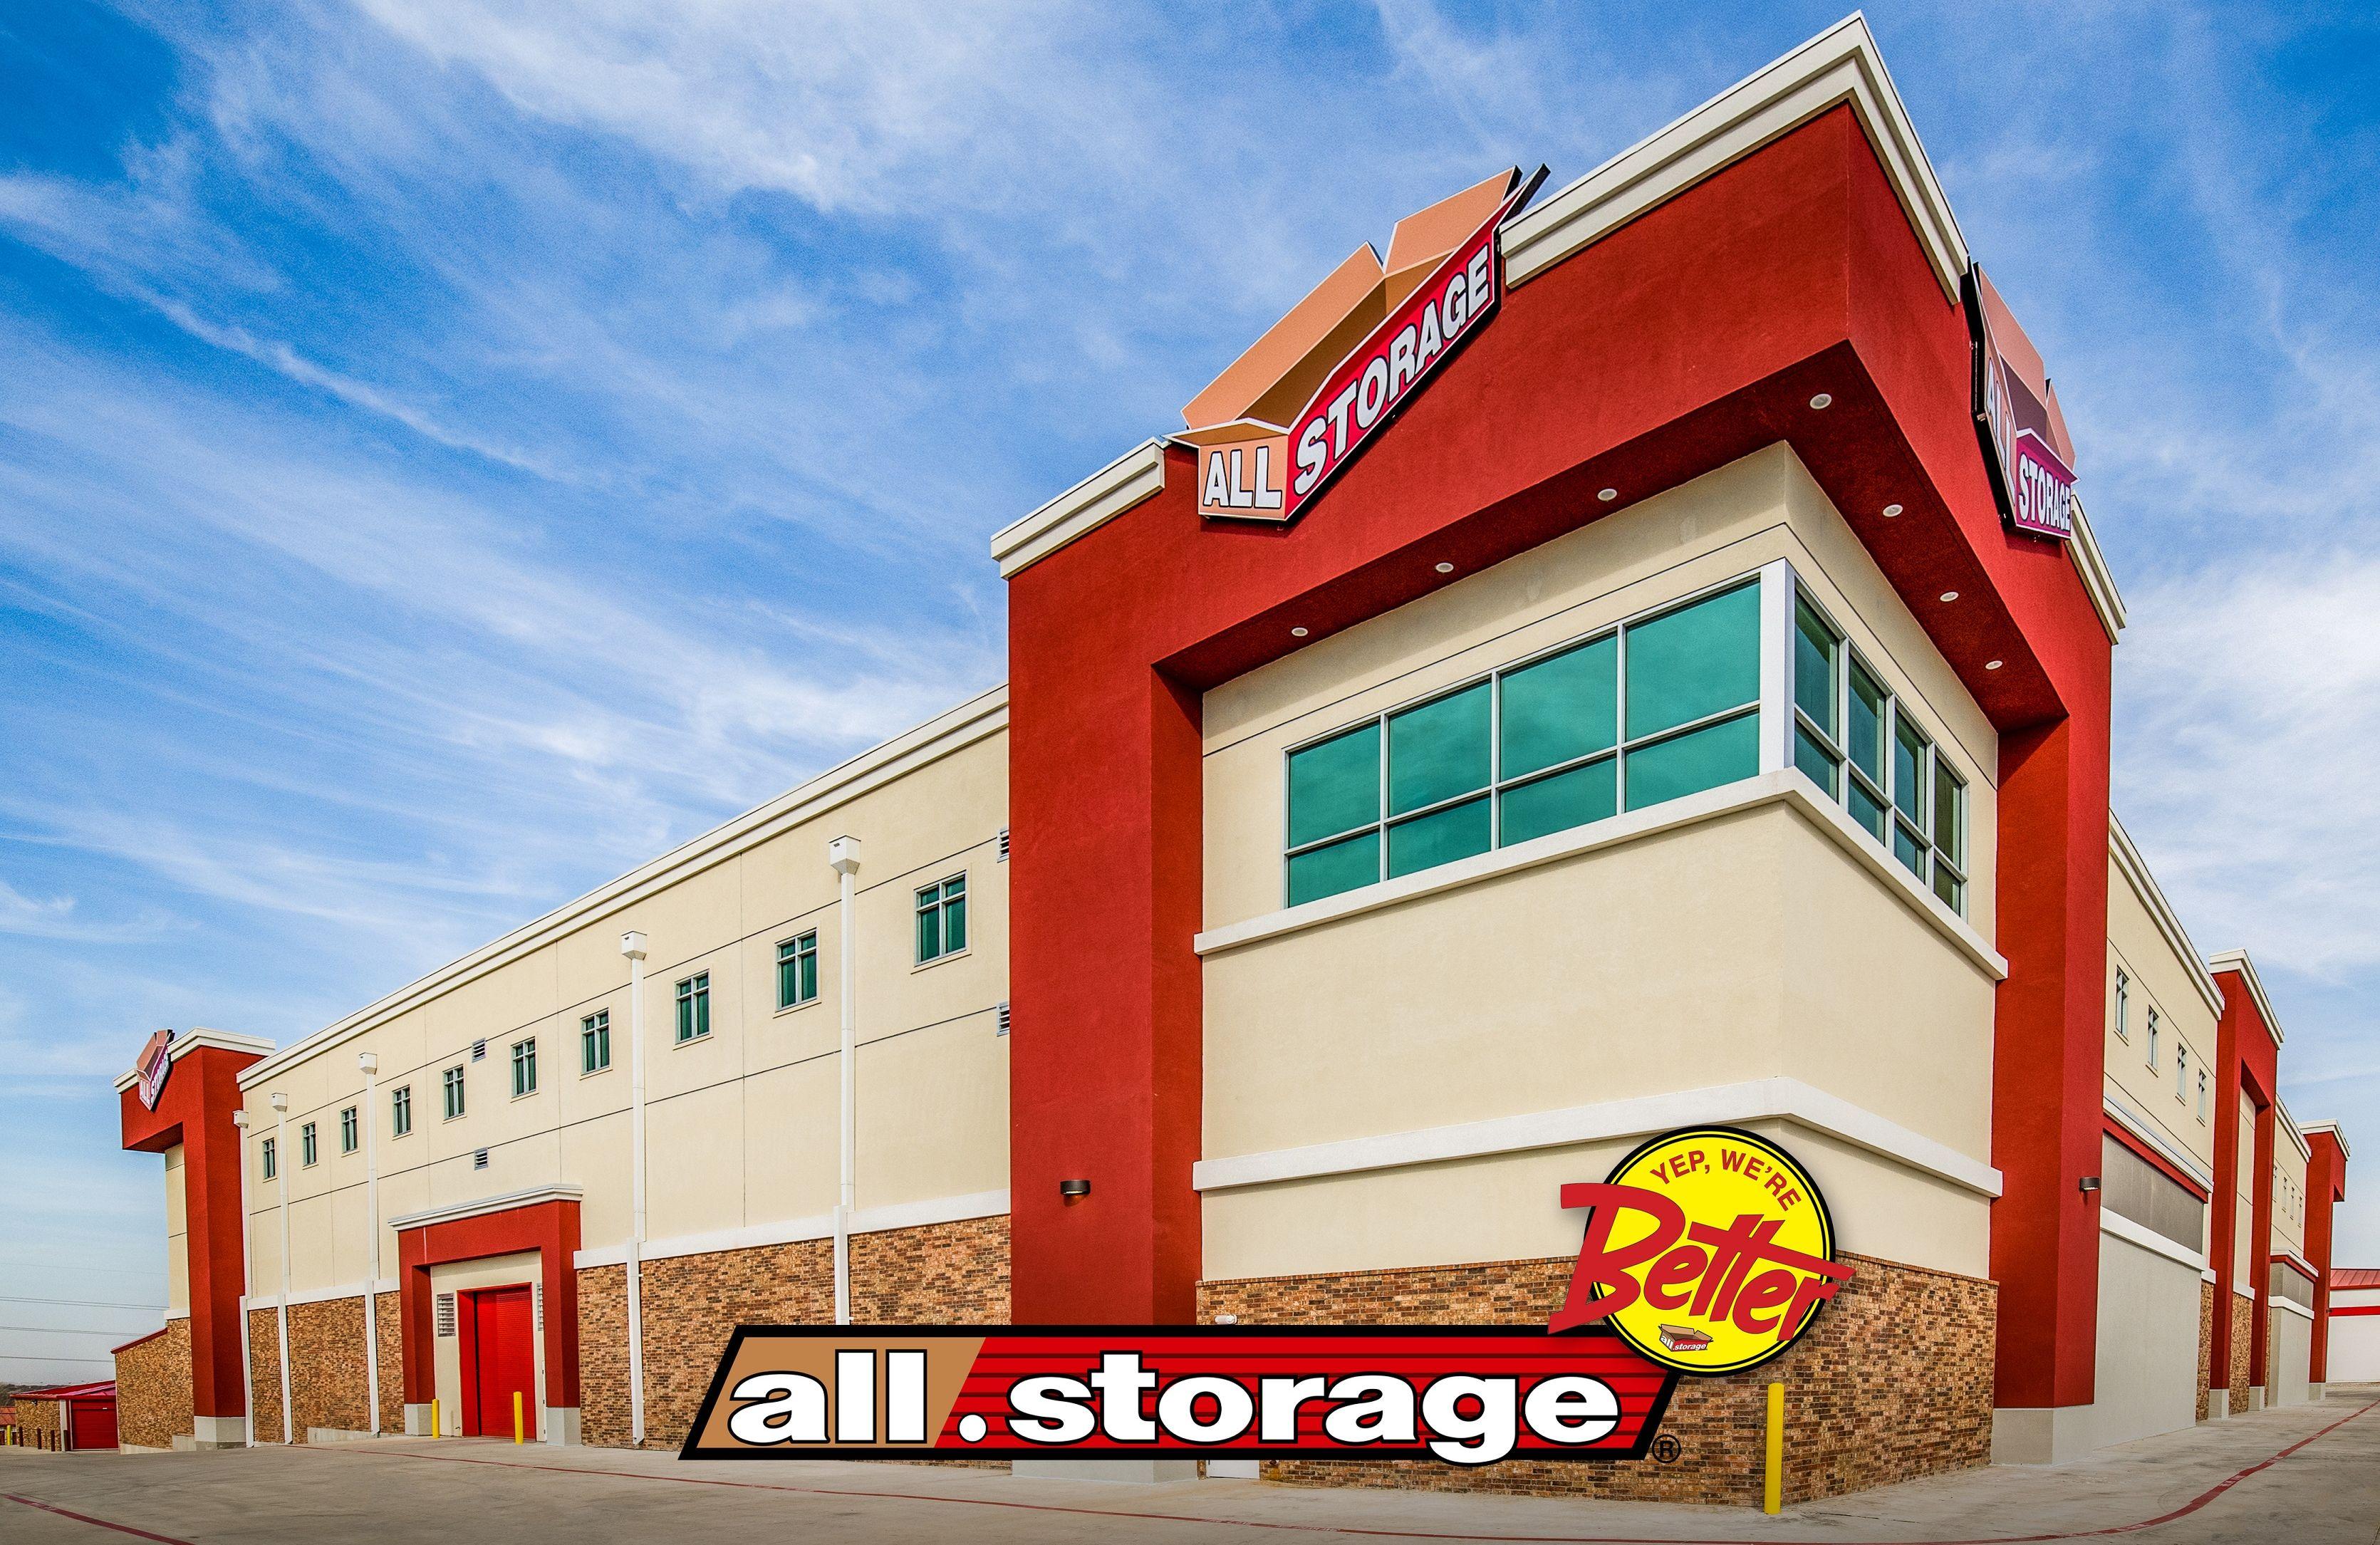 Storage Units In Fort Worth Tx 6900 Granbury Rd All Storage Online